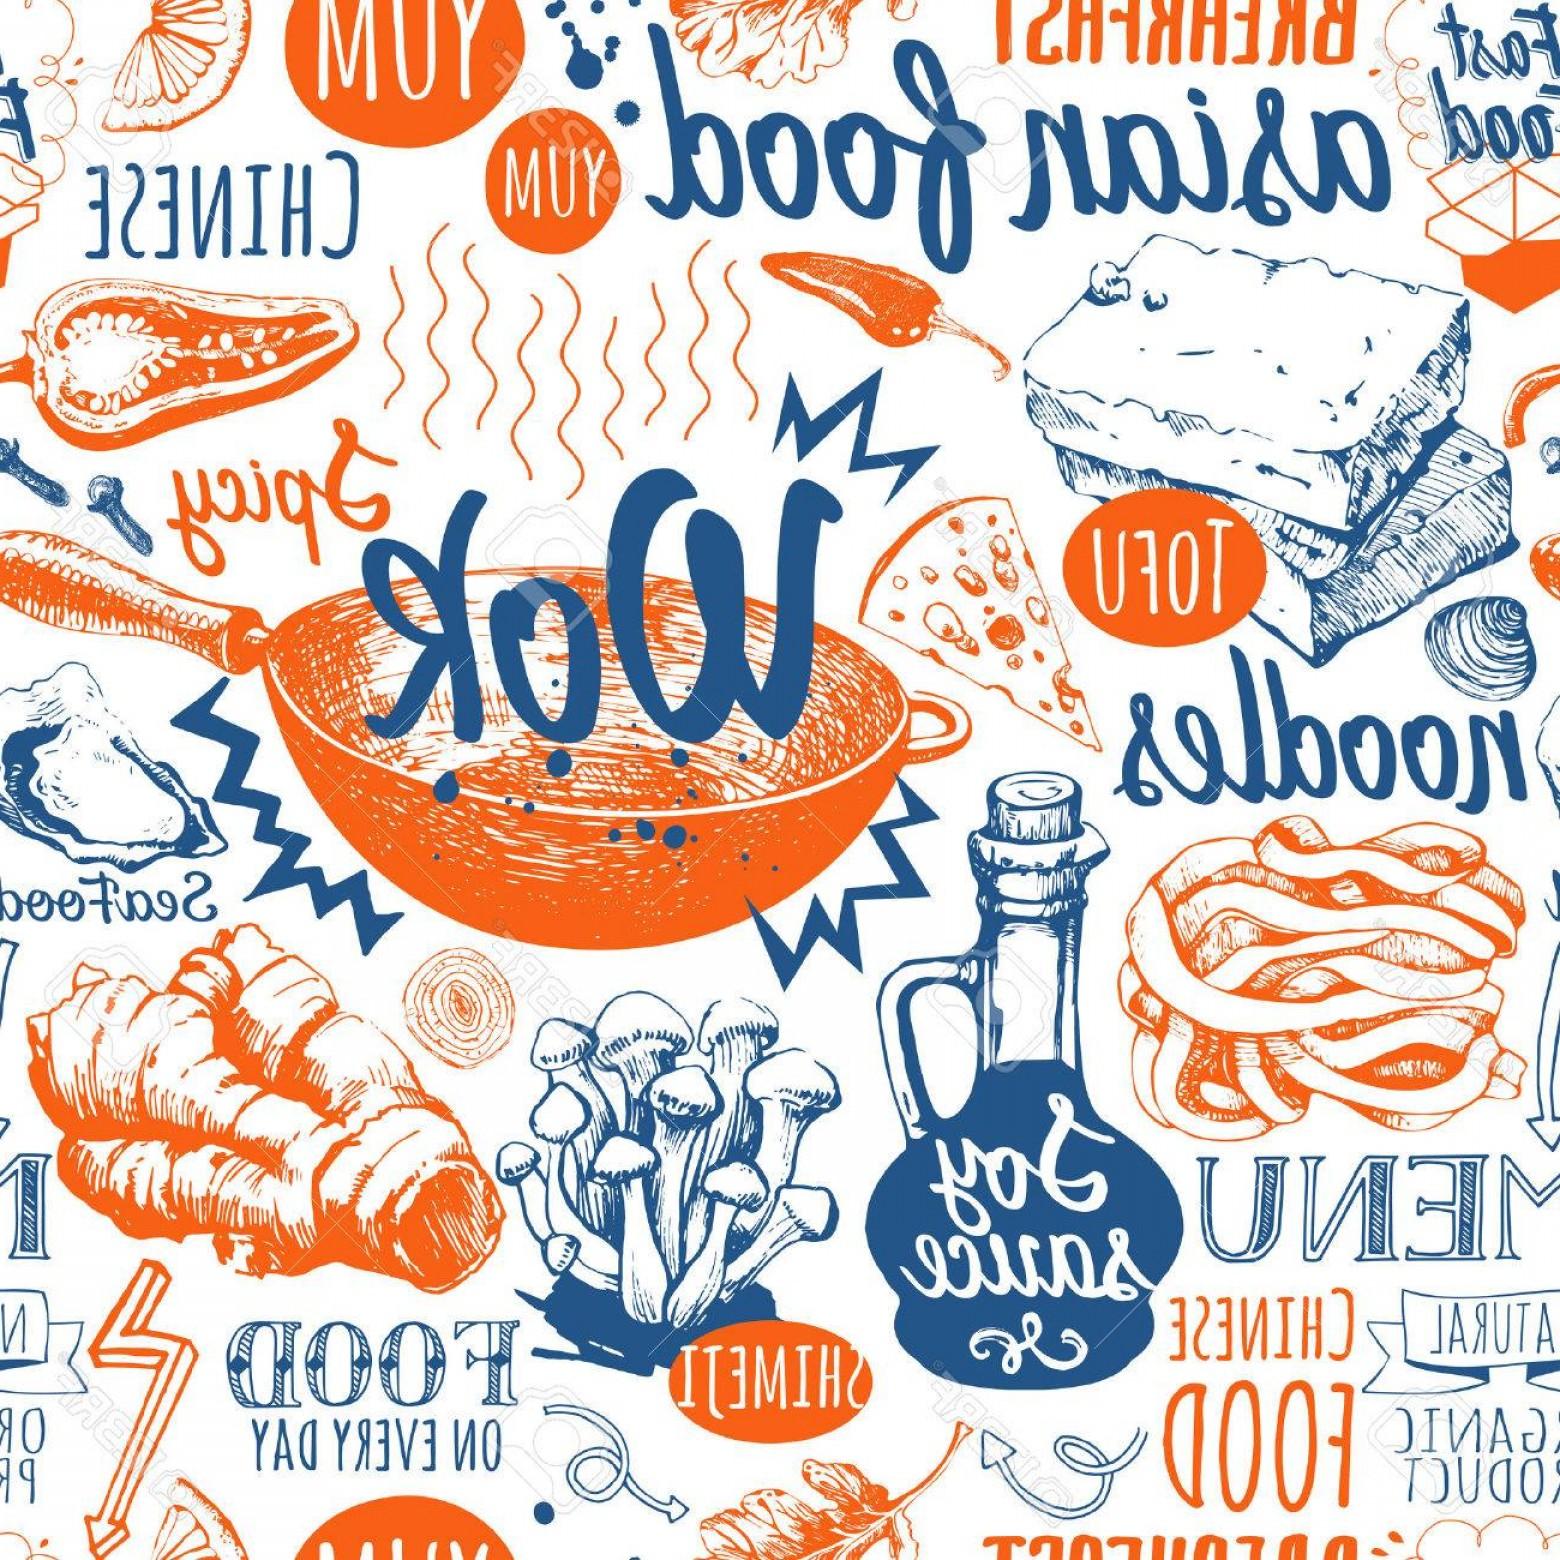 1560x1560 Photostock Vector Asian Street Food Vector Illustration With Funny